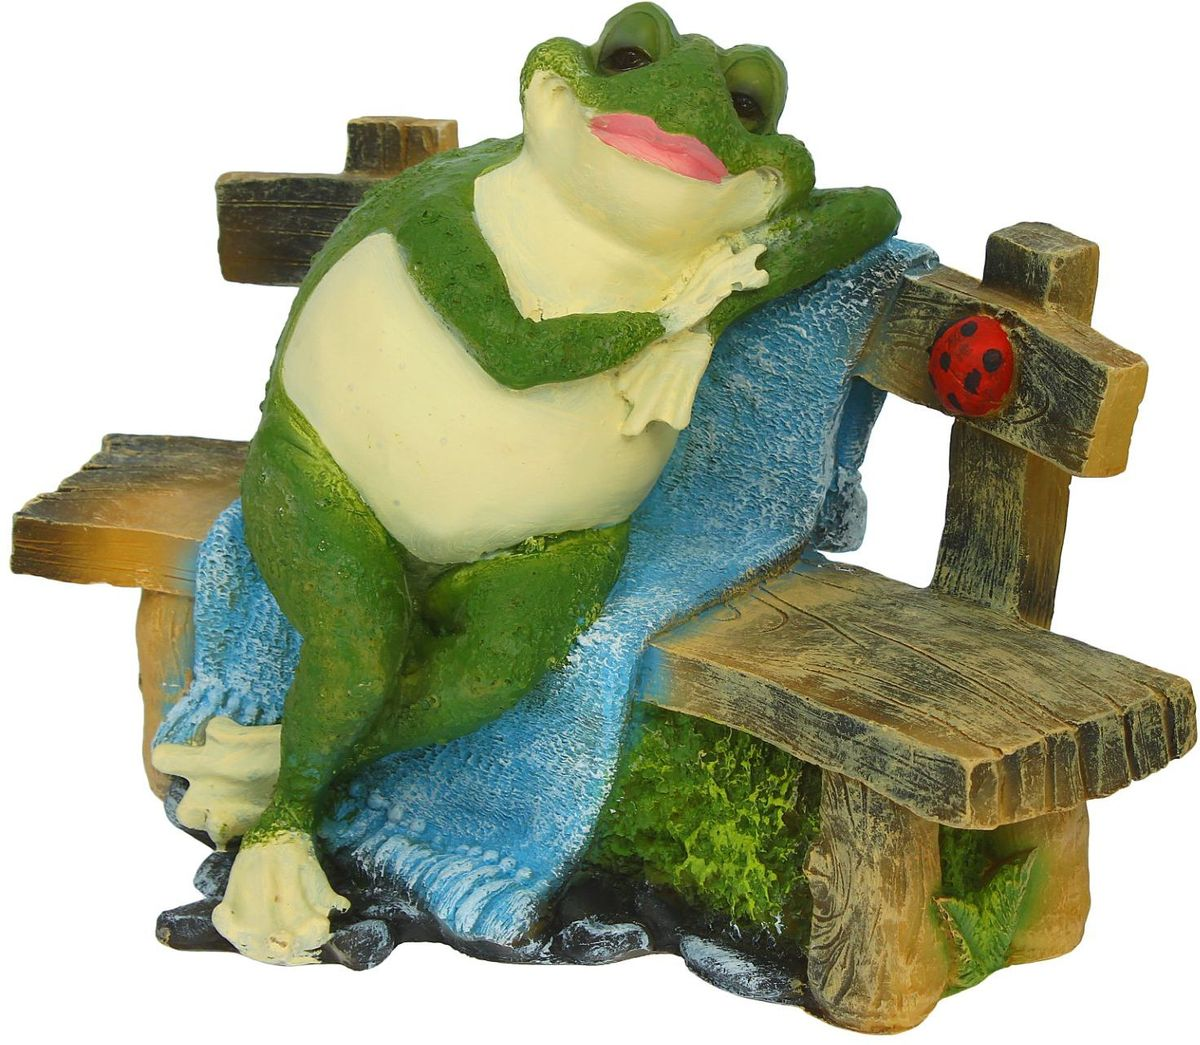 Фигура садовая Сидящая лягушка на лавочке, 23 х 38 х 27 см1360693